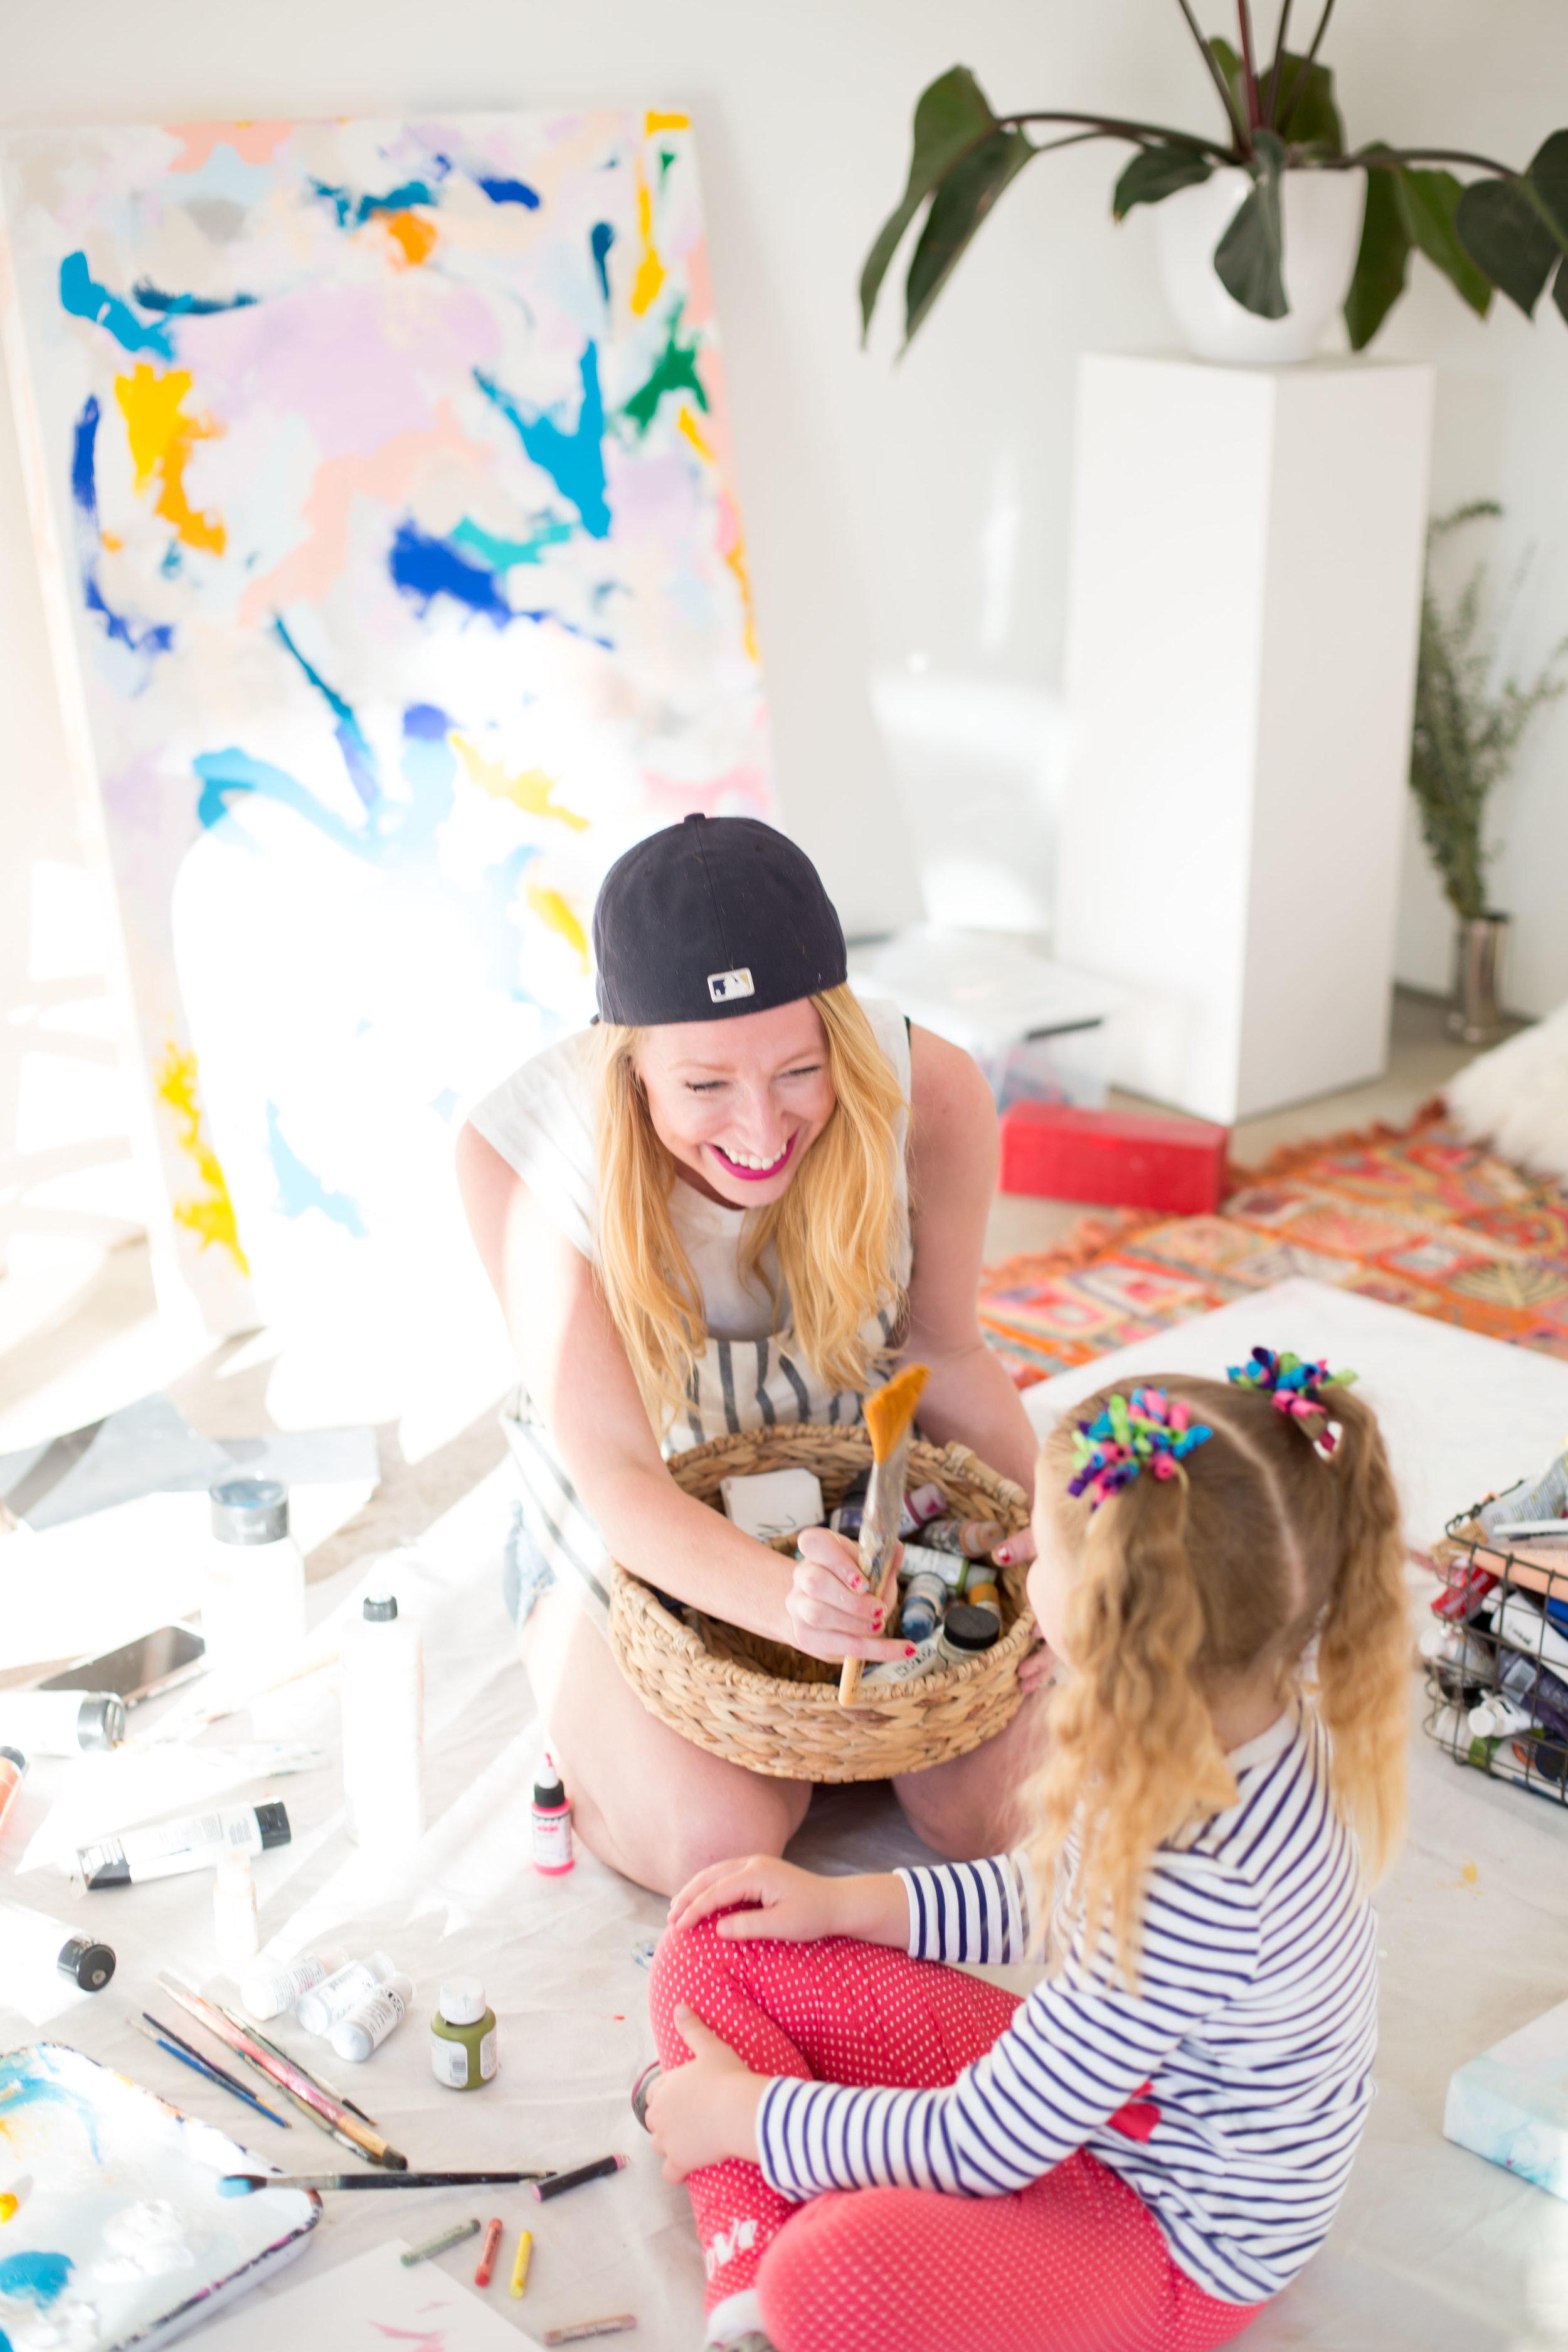 san-diego-branding-photographer-kids-painting-samantha-louise-marett-artist-11